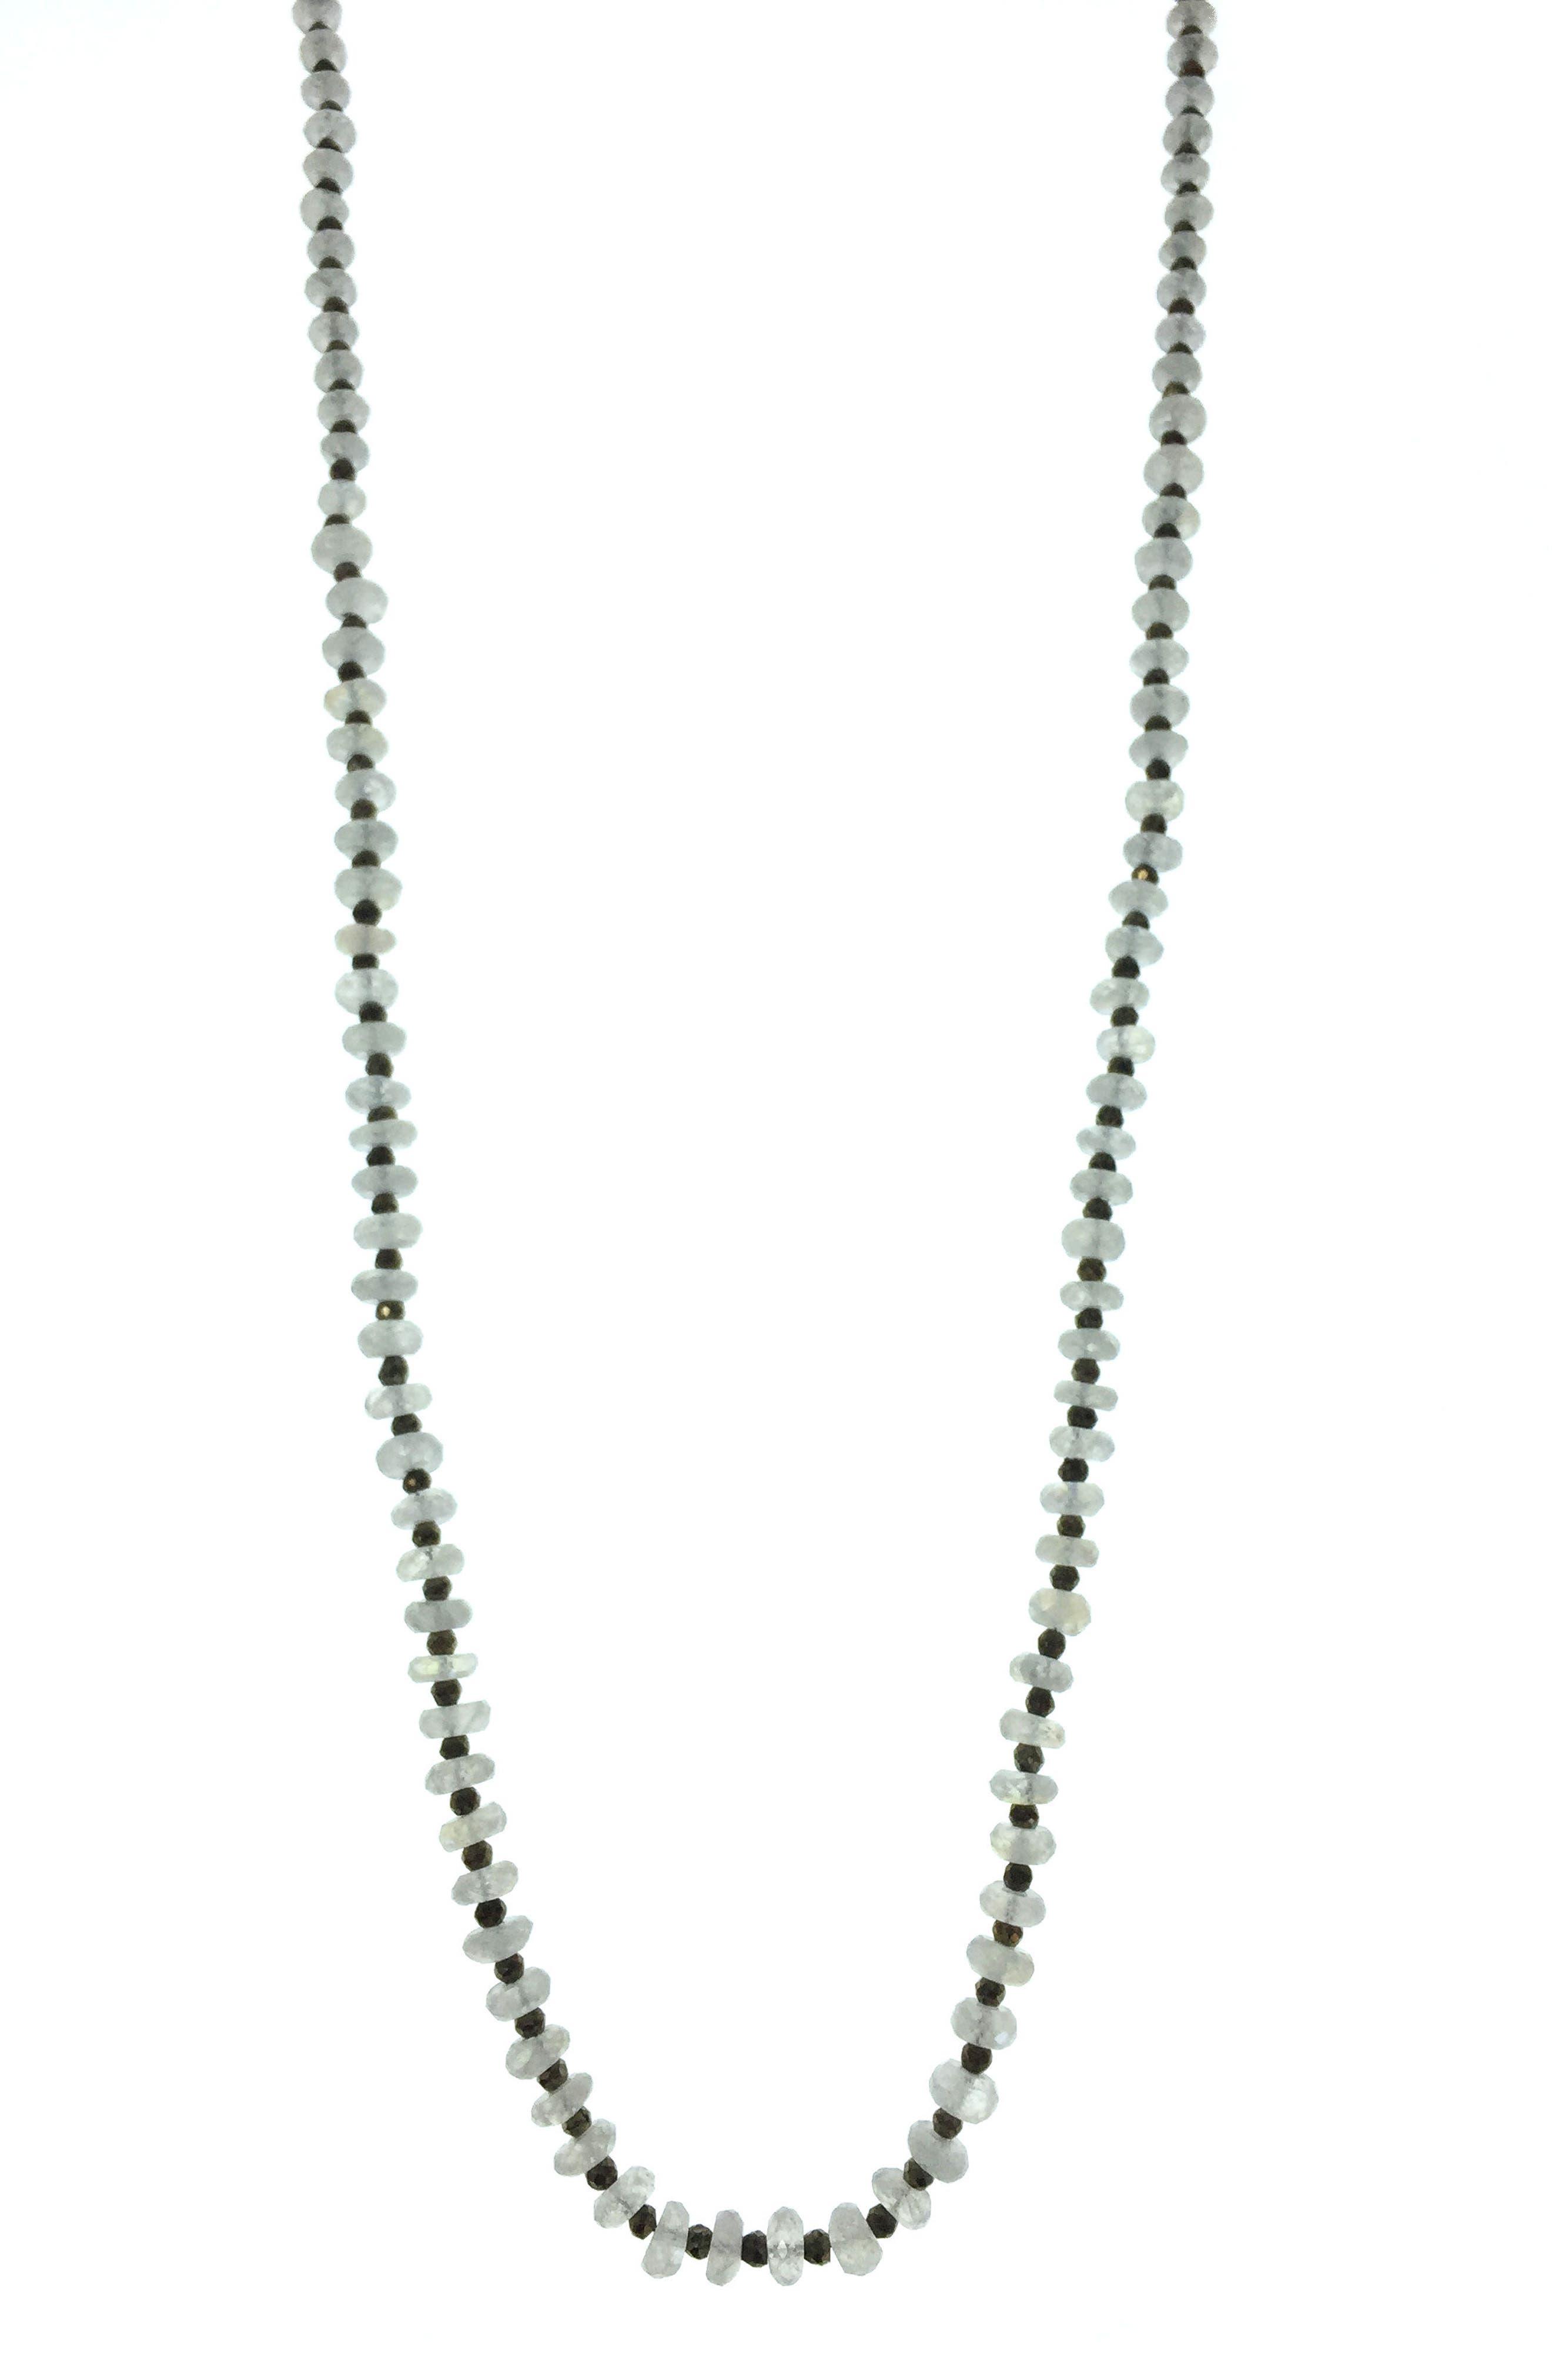 Solana Semiprecious Stone Necklace,                         Main,                         color, 104